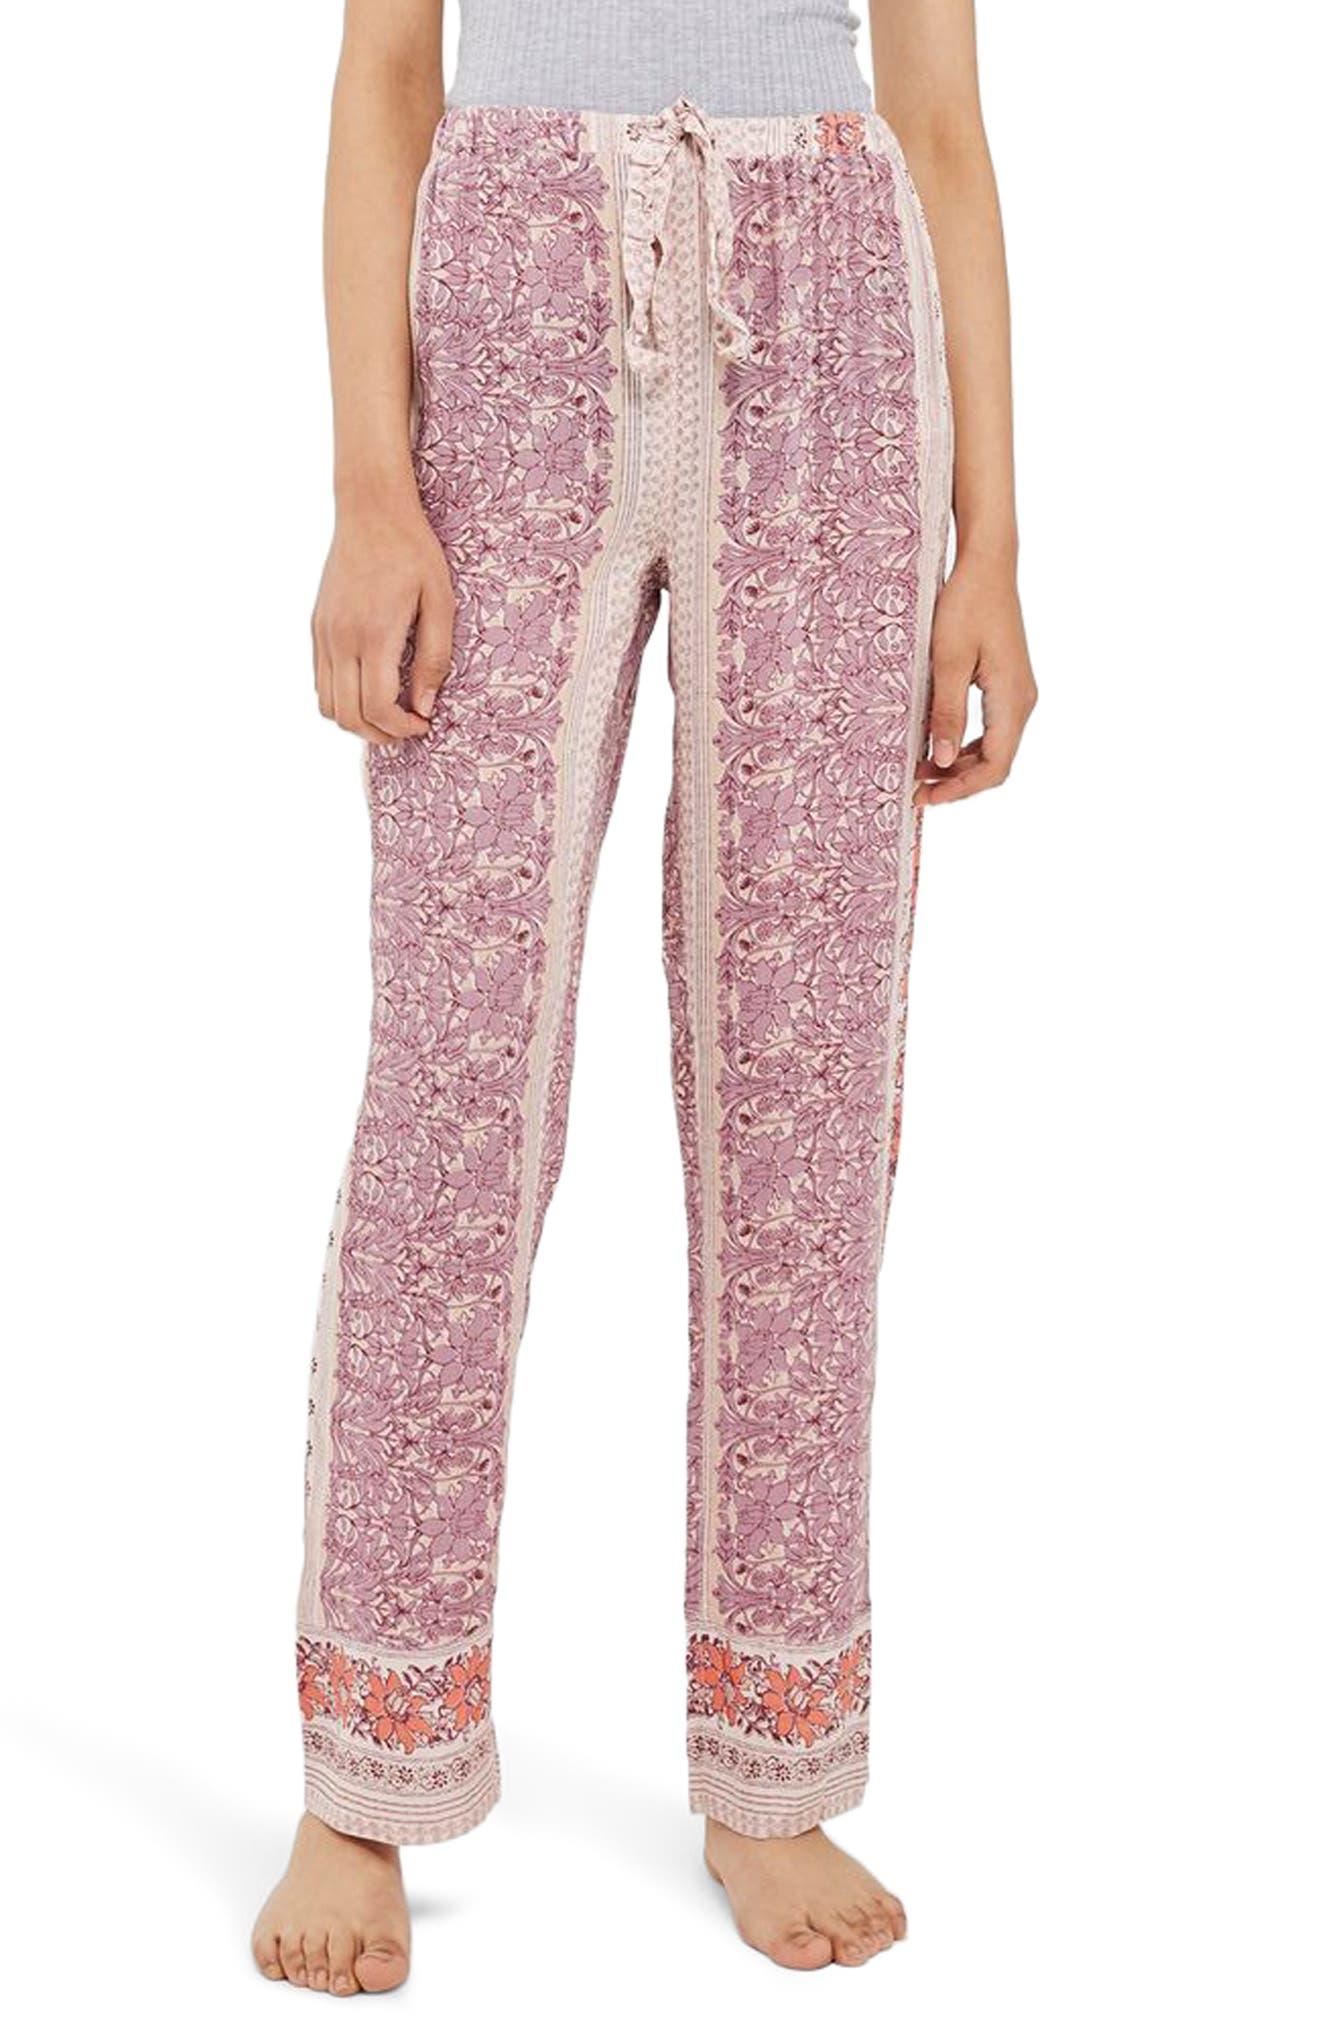 Bohemian Floral Print Pajama Pants,                             Main thumbnail 1, color,                             530